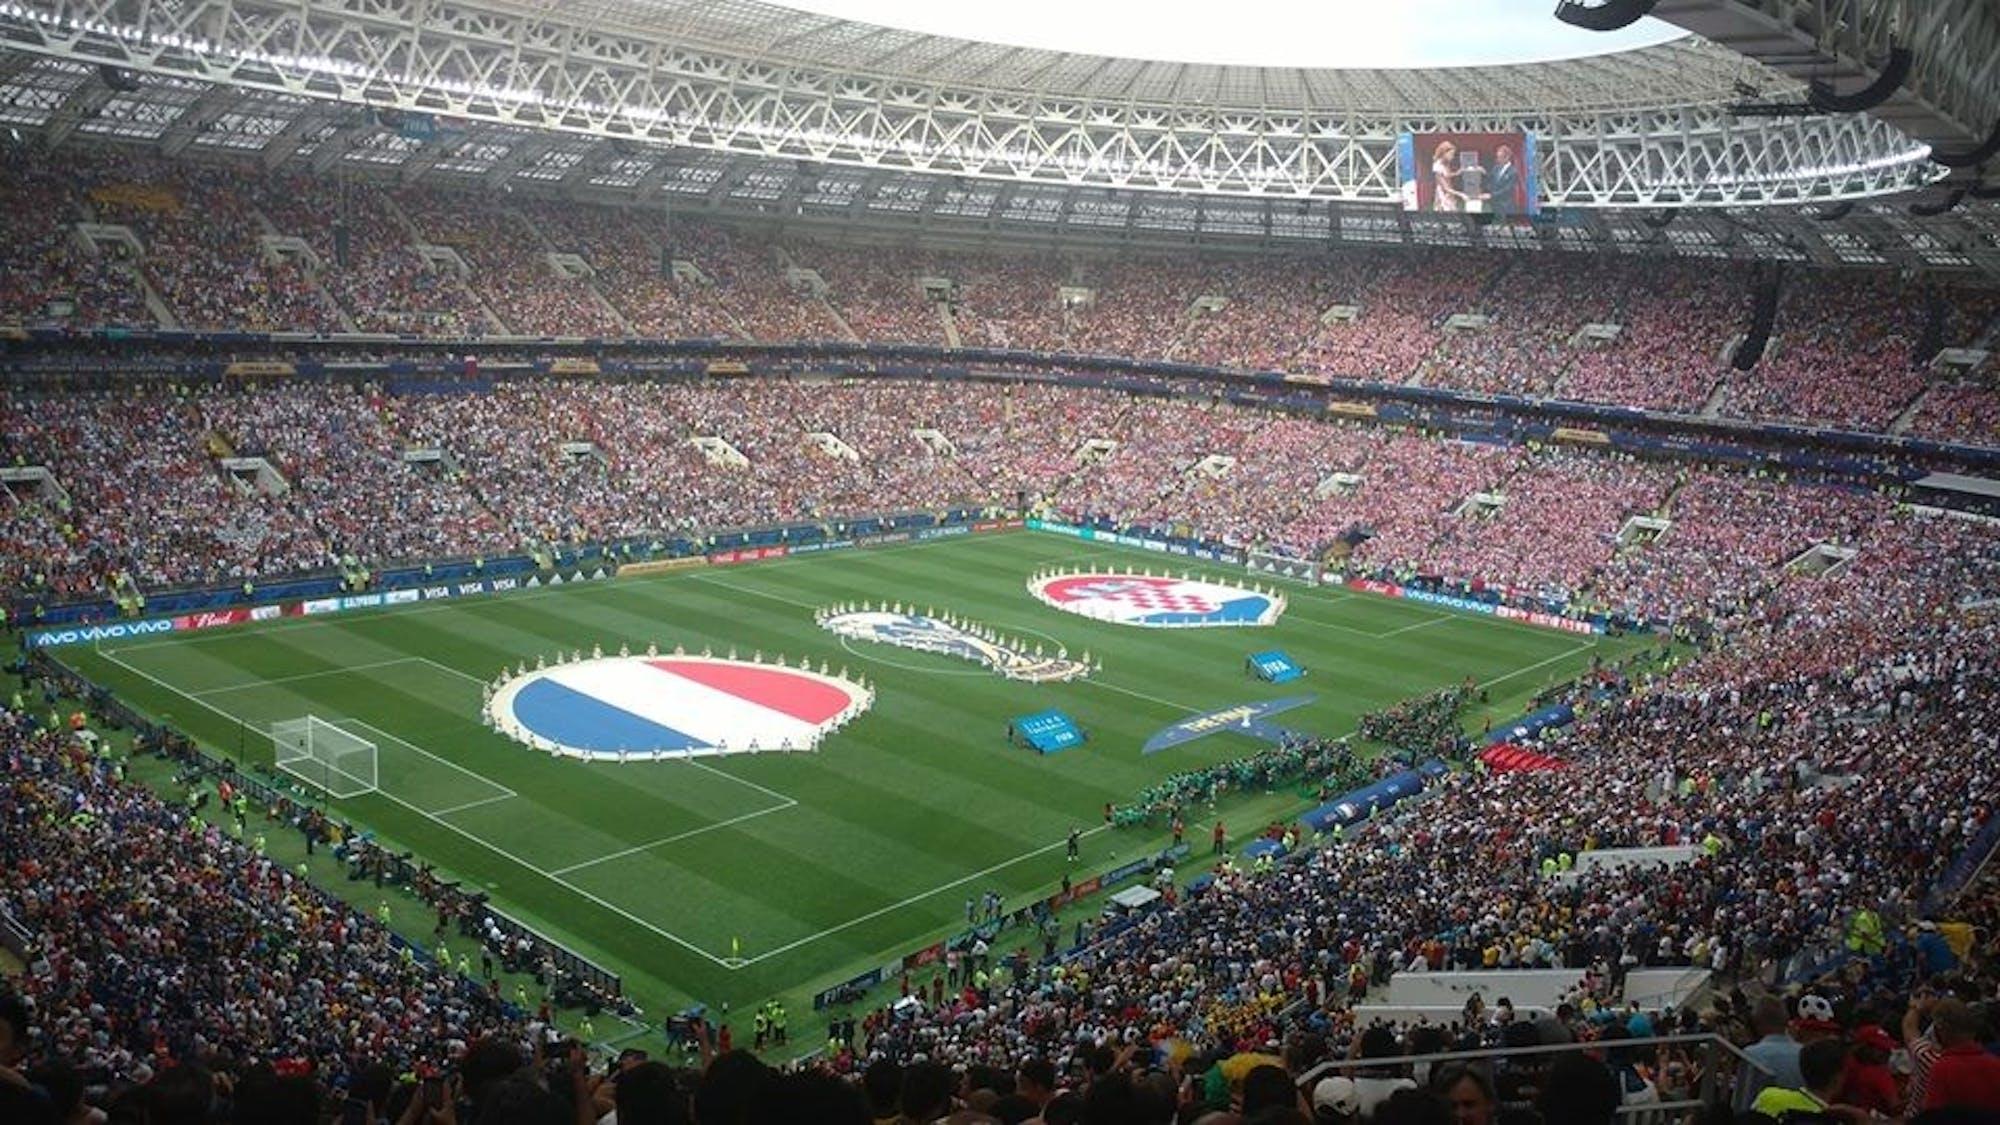 2018-world-cup-final-france-v-croatia